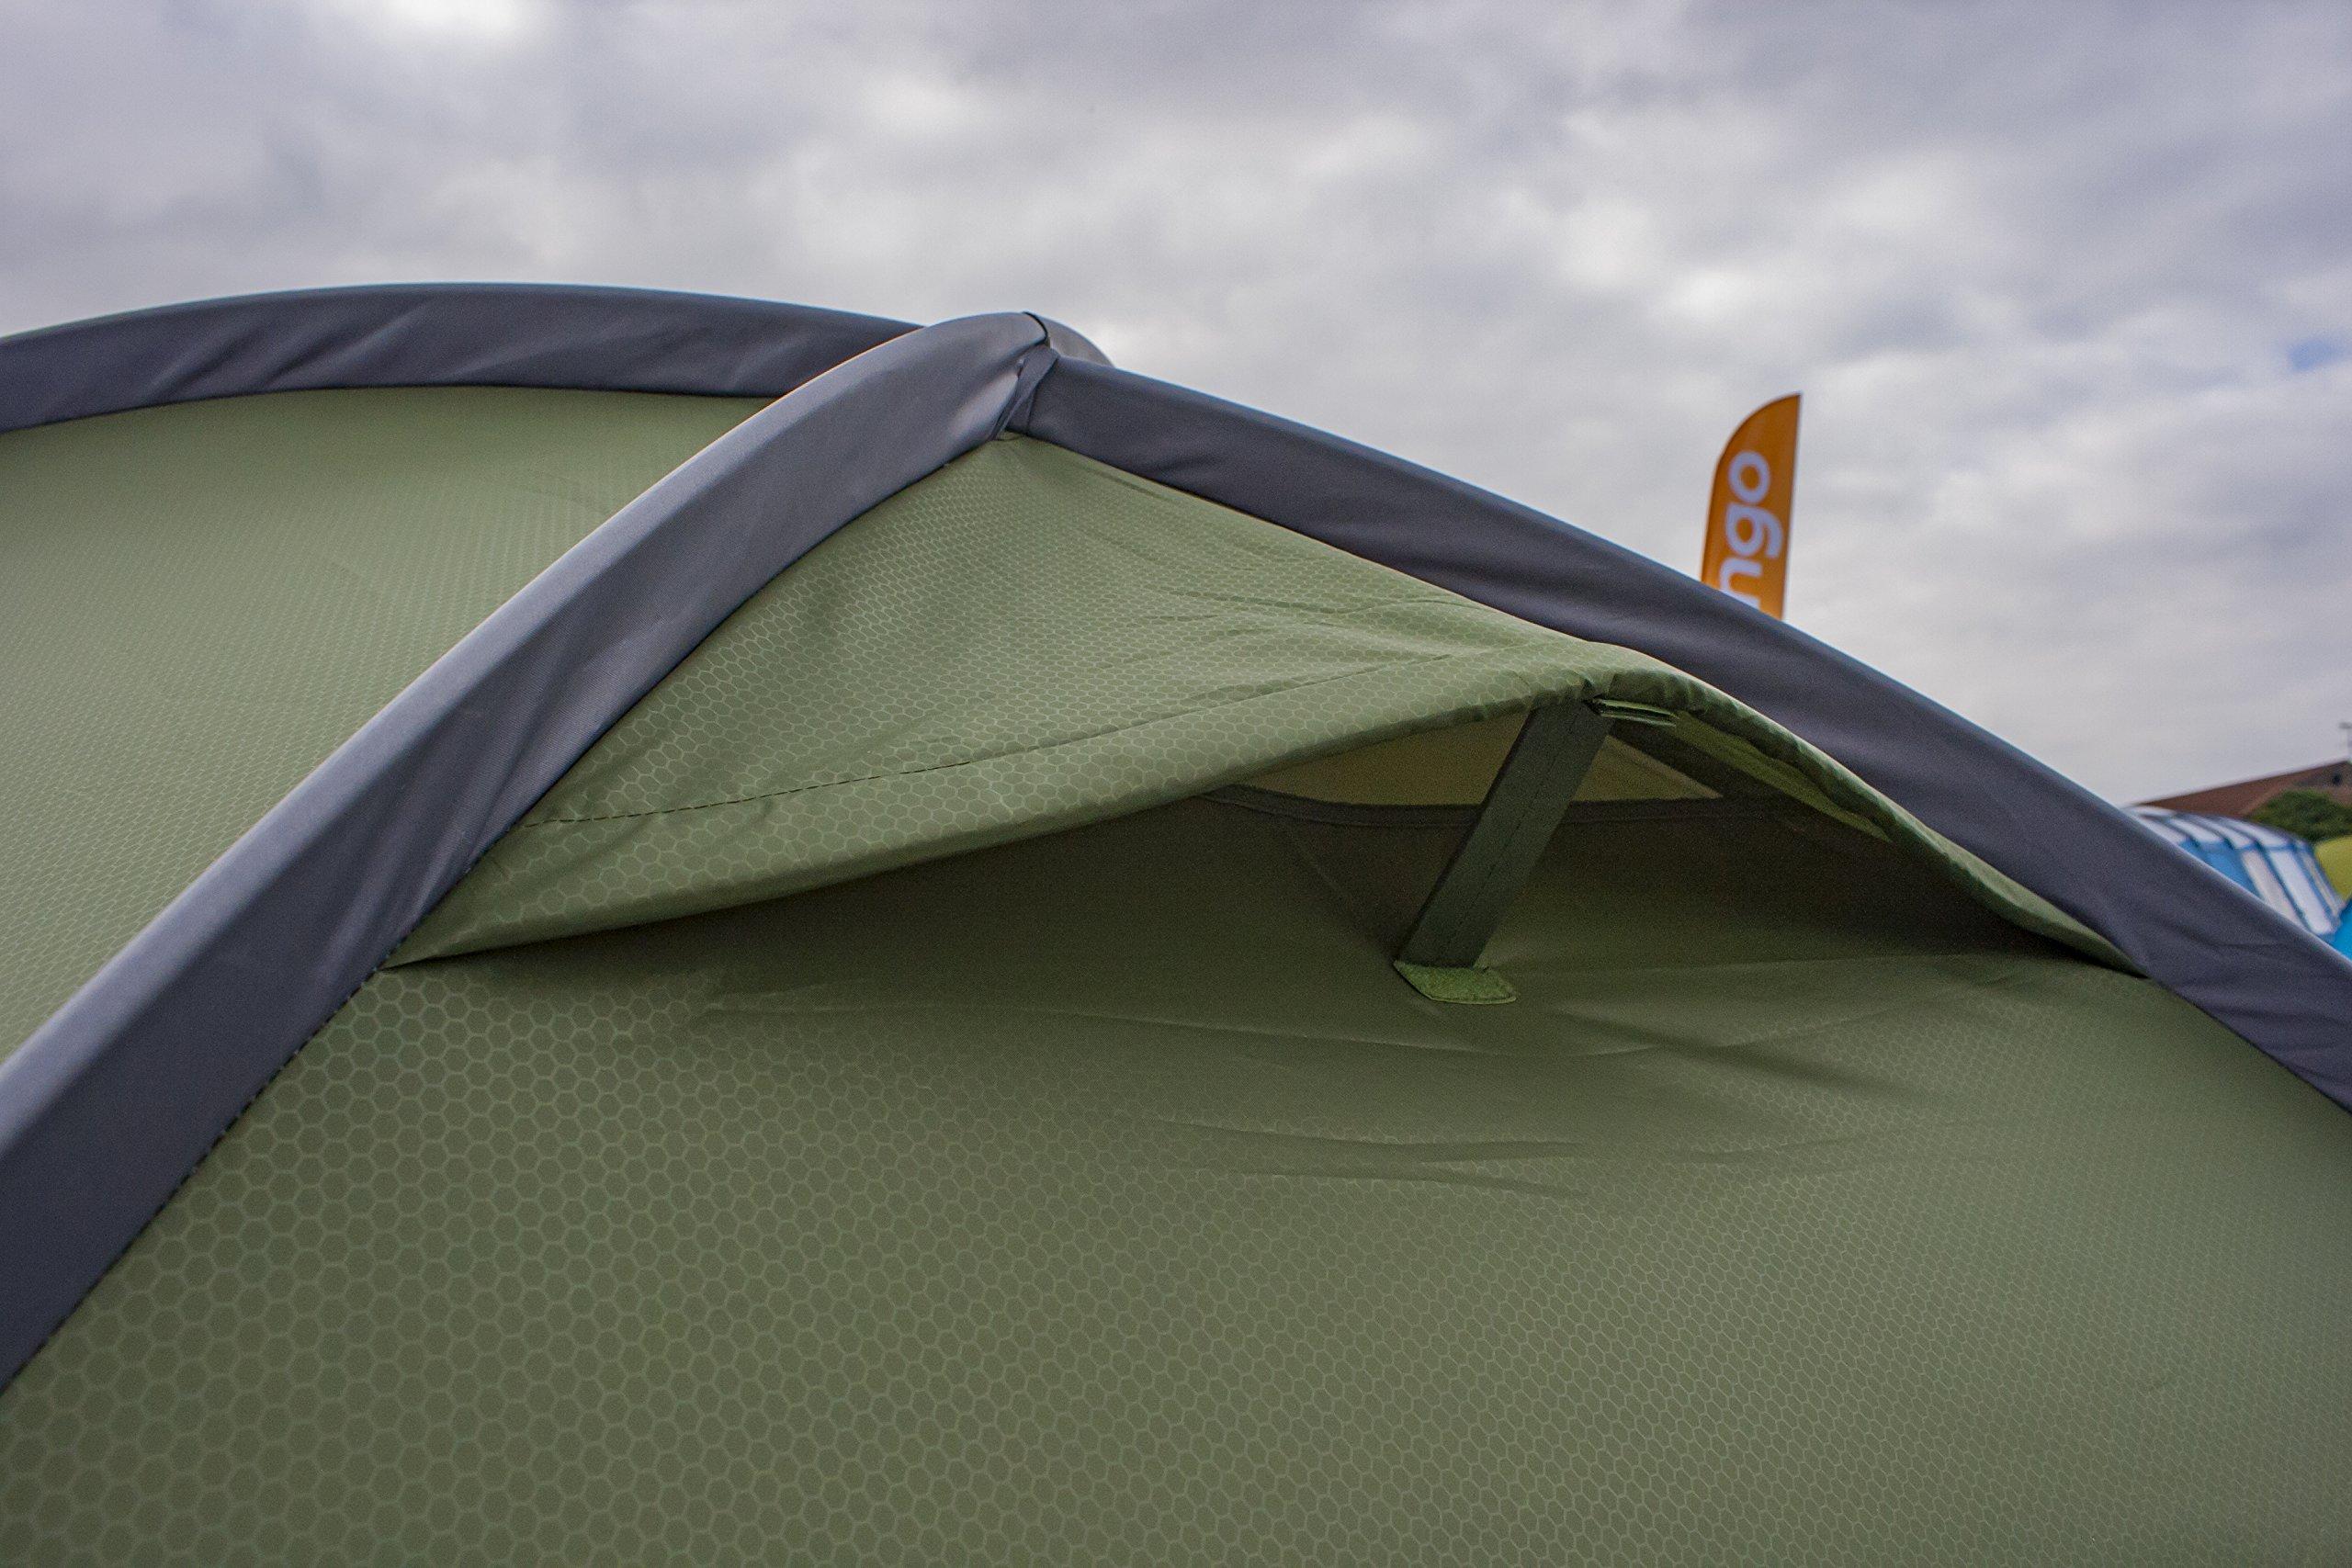 Vango Hydra Trekking Tent, Cactus Green, 200 6